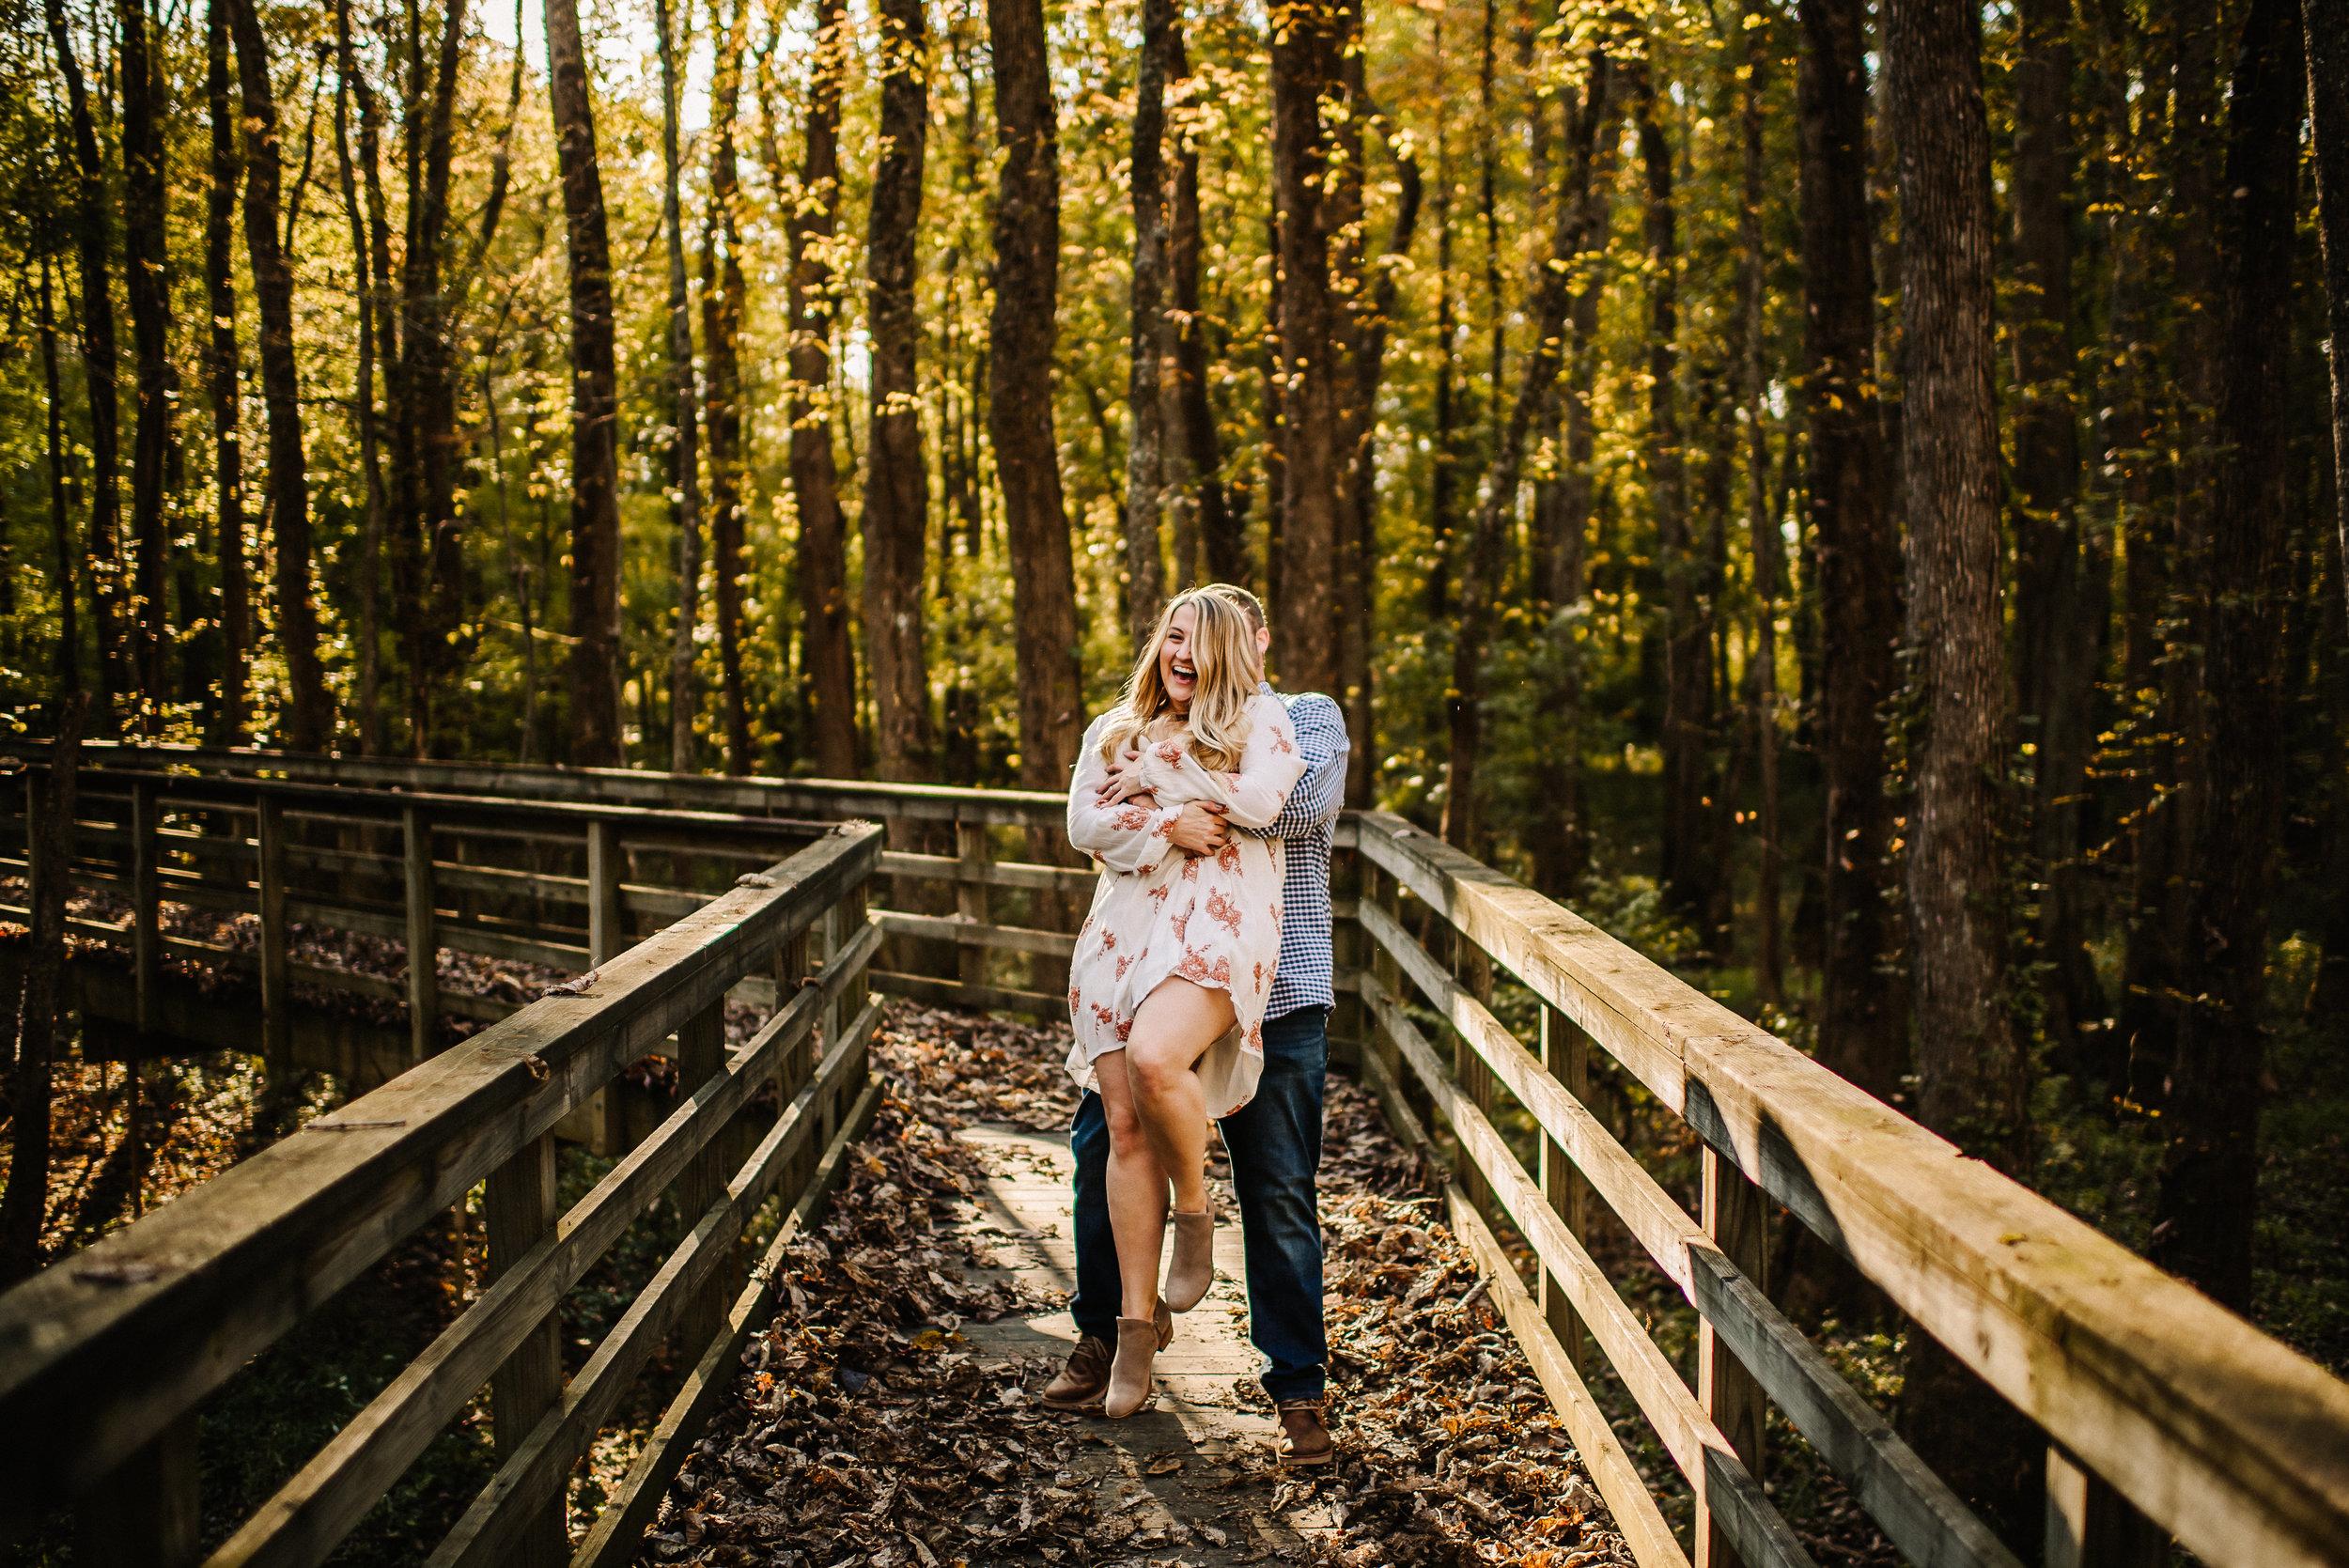 Romantic Fall Engagement Photography_Alexis & Jacob_Ashley Benham Photography-42.jpg